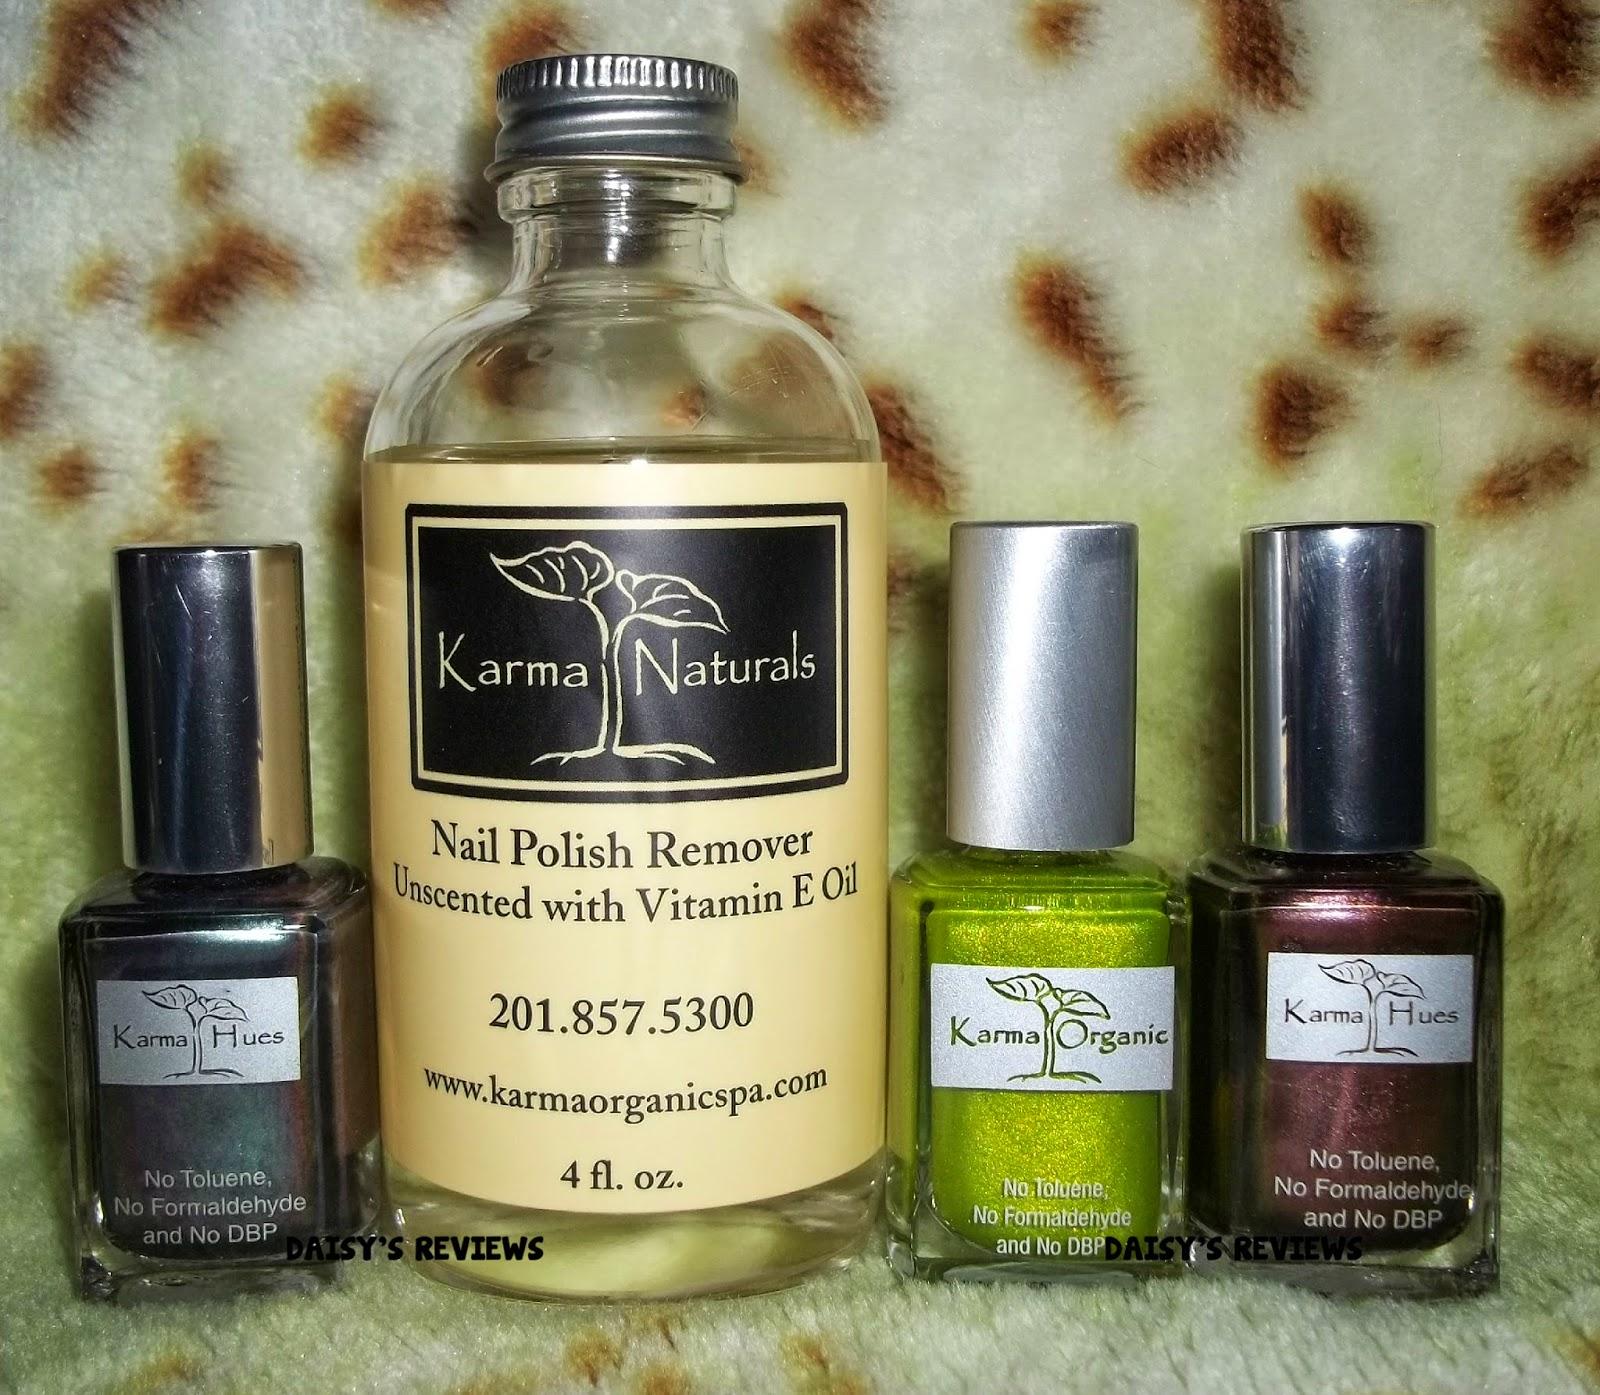 Welcome To Daisy S Reviews Karma Organic Spa Nail Polishes And Nail